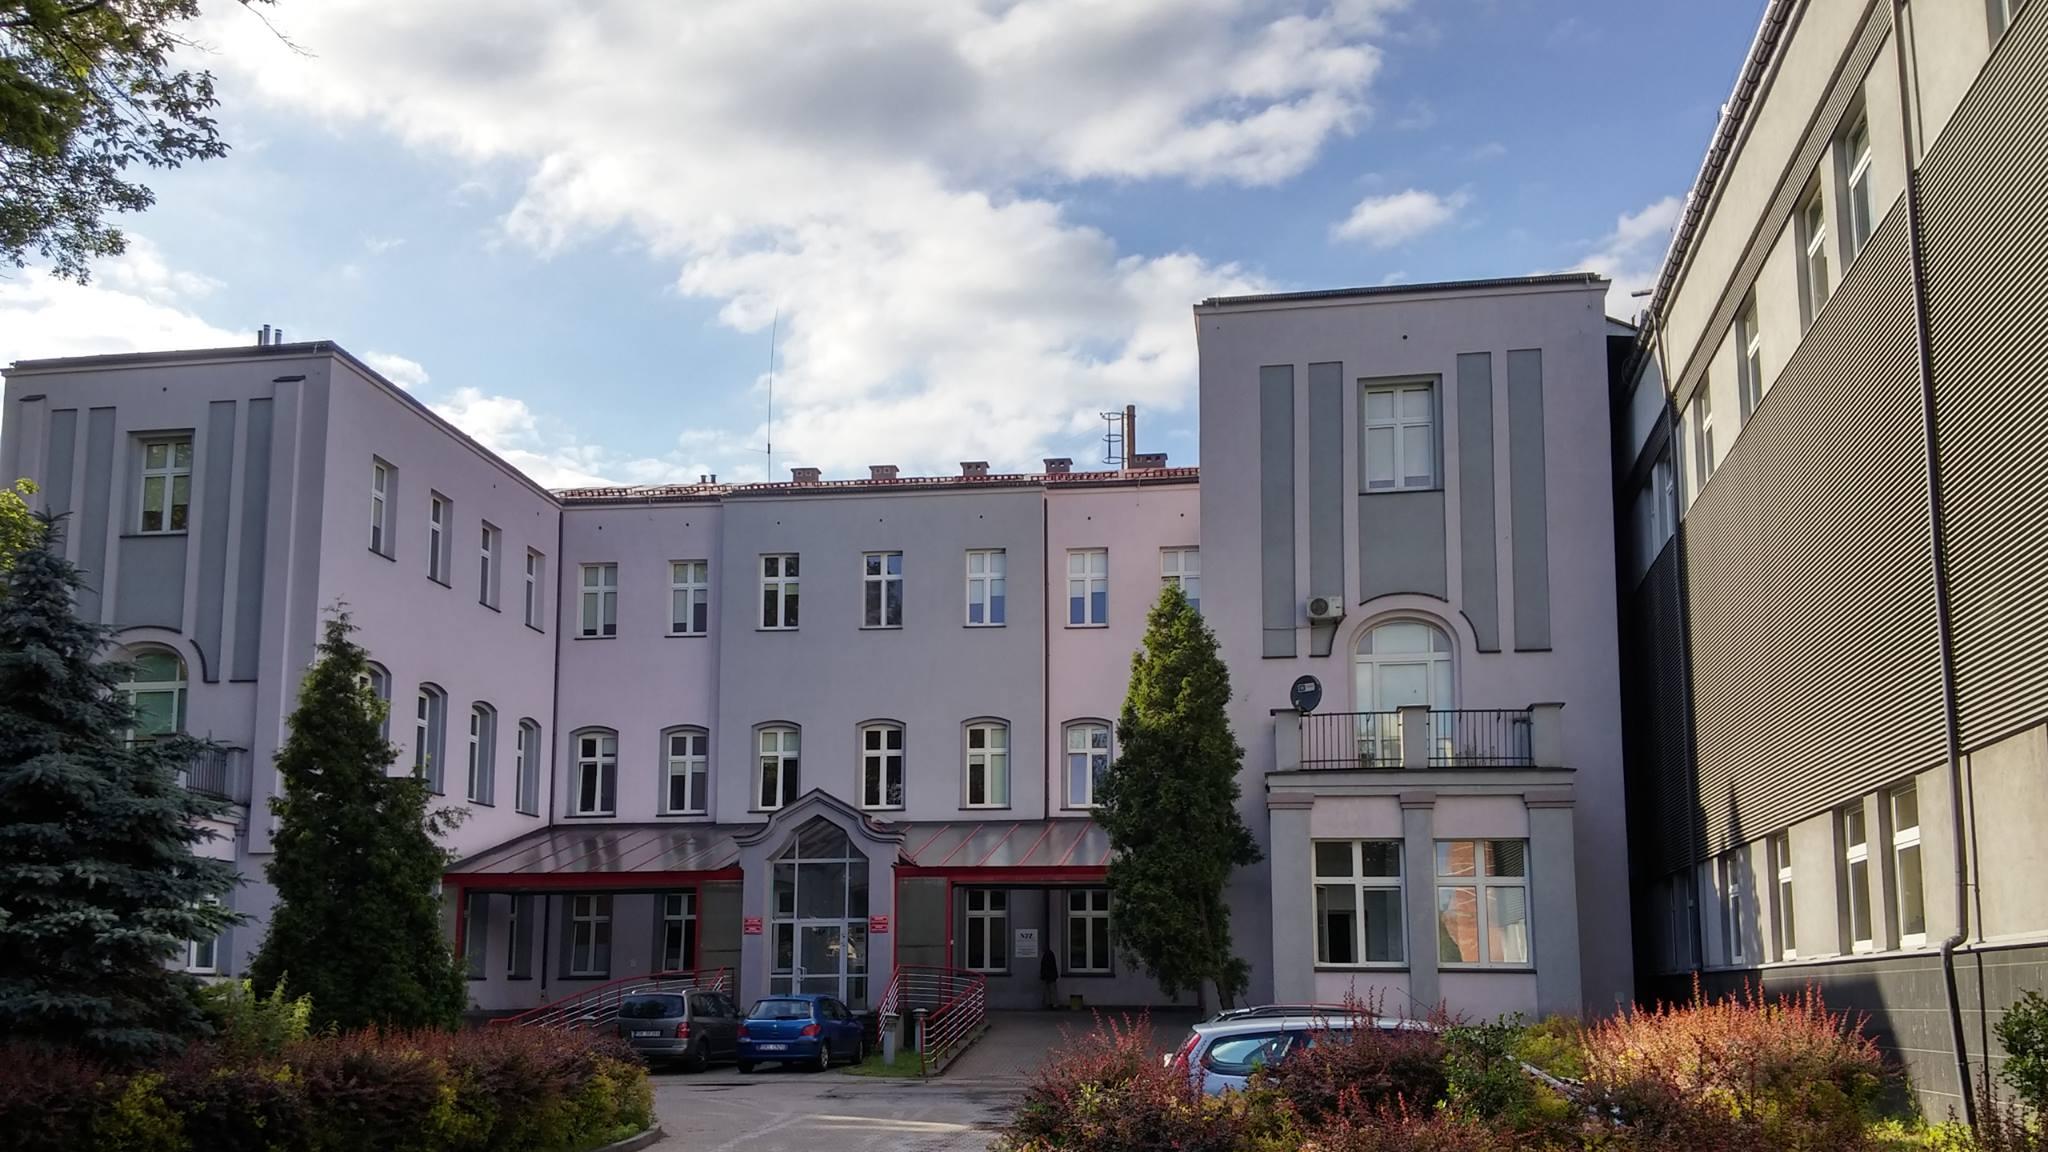 Szpital ul. Mirowska 15